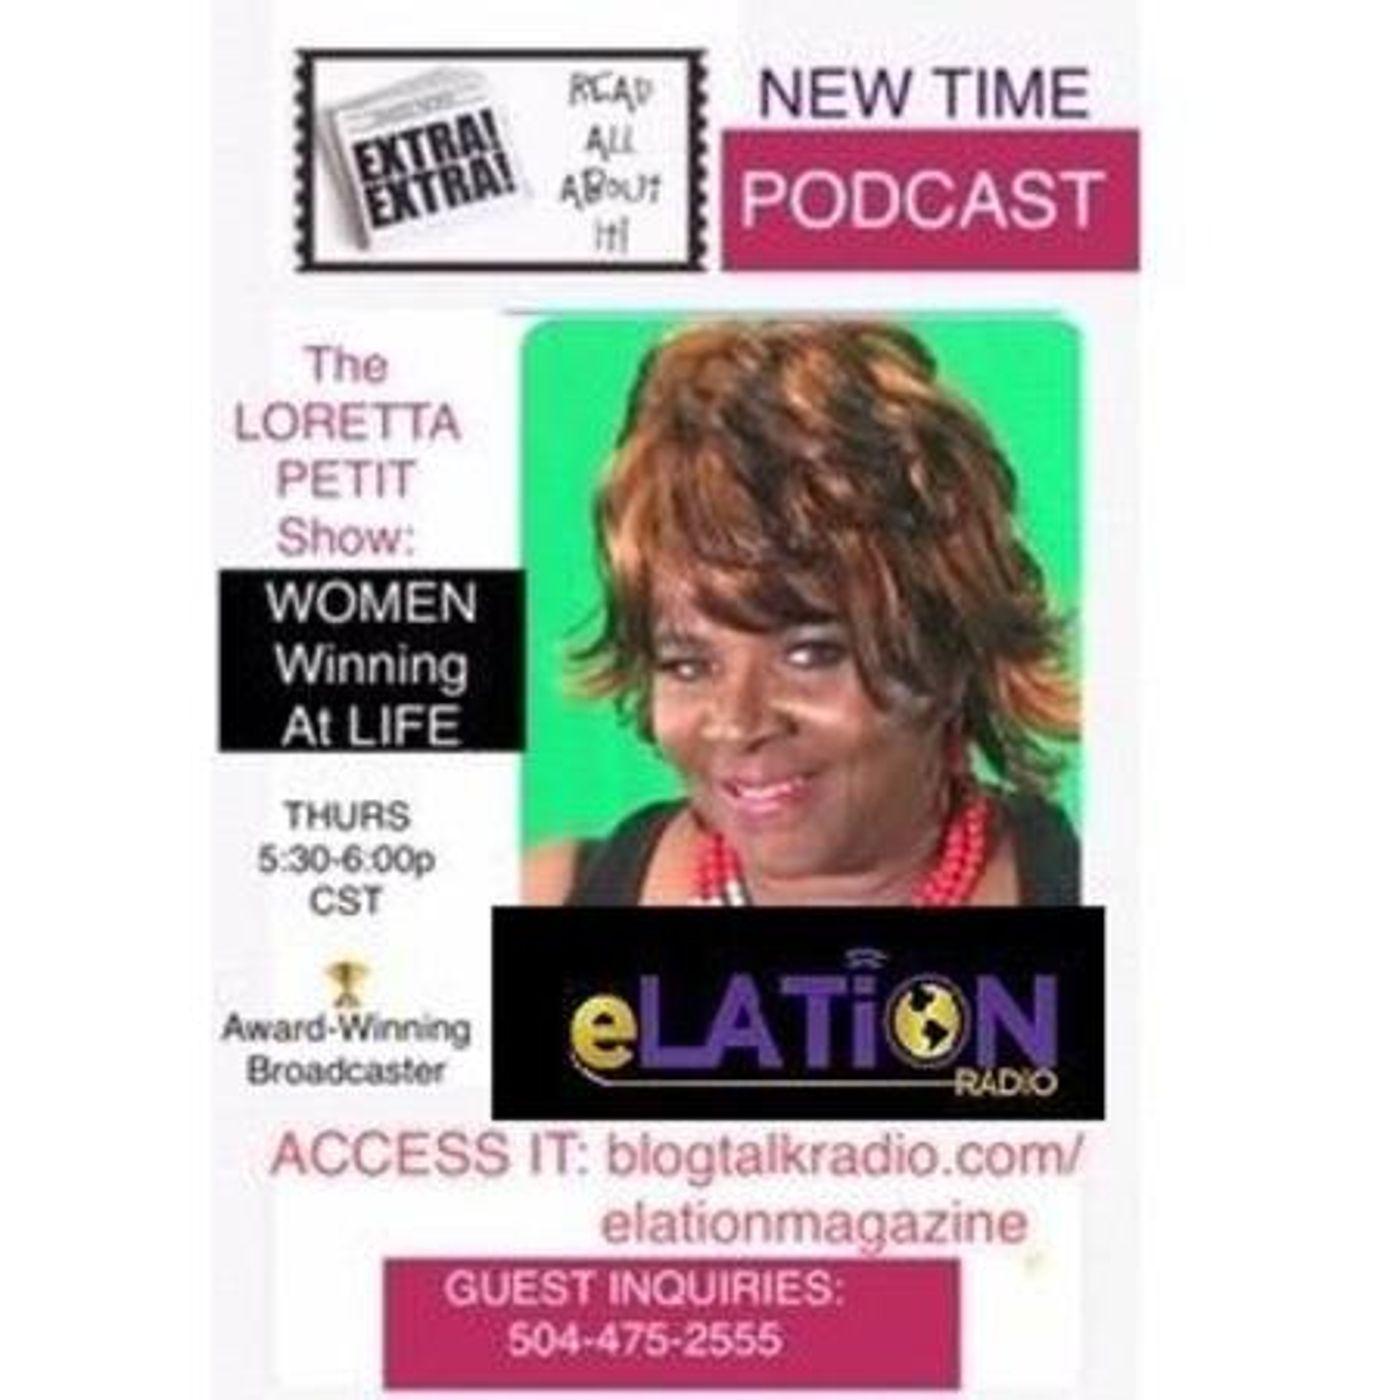 The Loretta Petit Show with Dr Loretta Petit